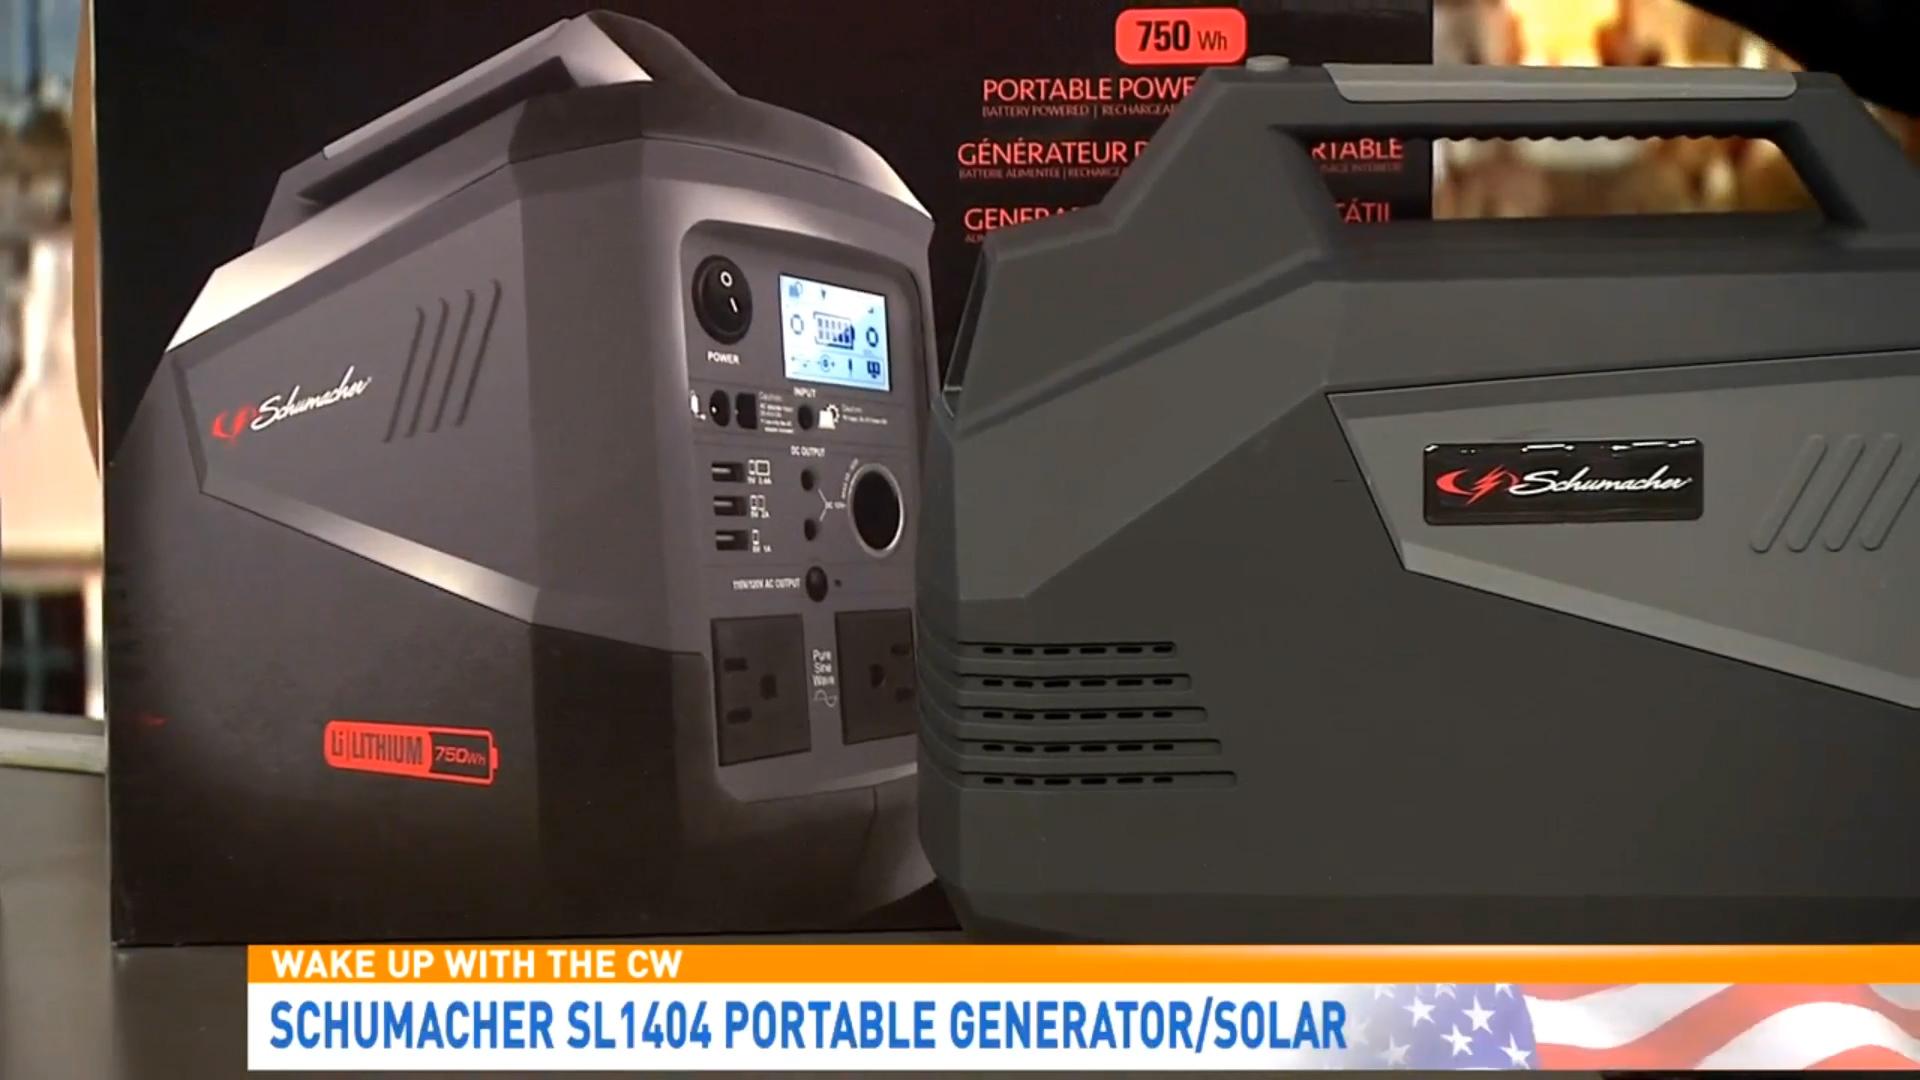 SCHUMACHER SL1404 PORTABLE GENERATOR/SOLAR - $1199.95Shop Now